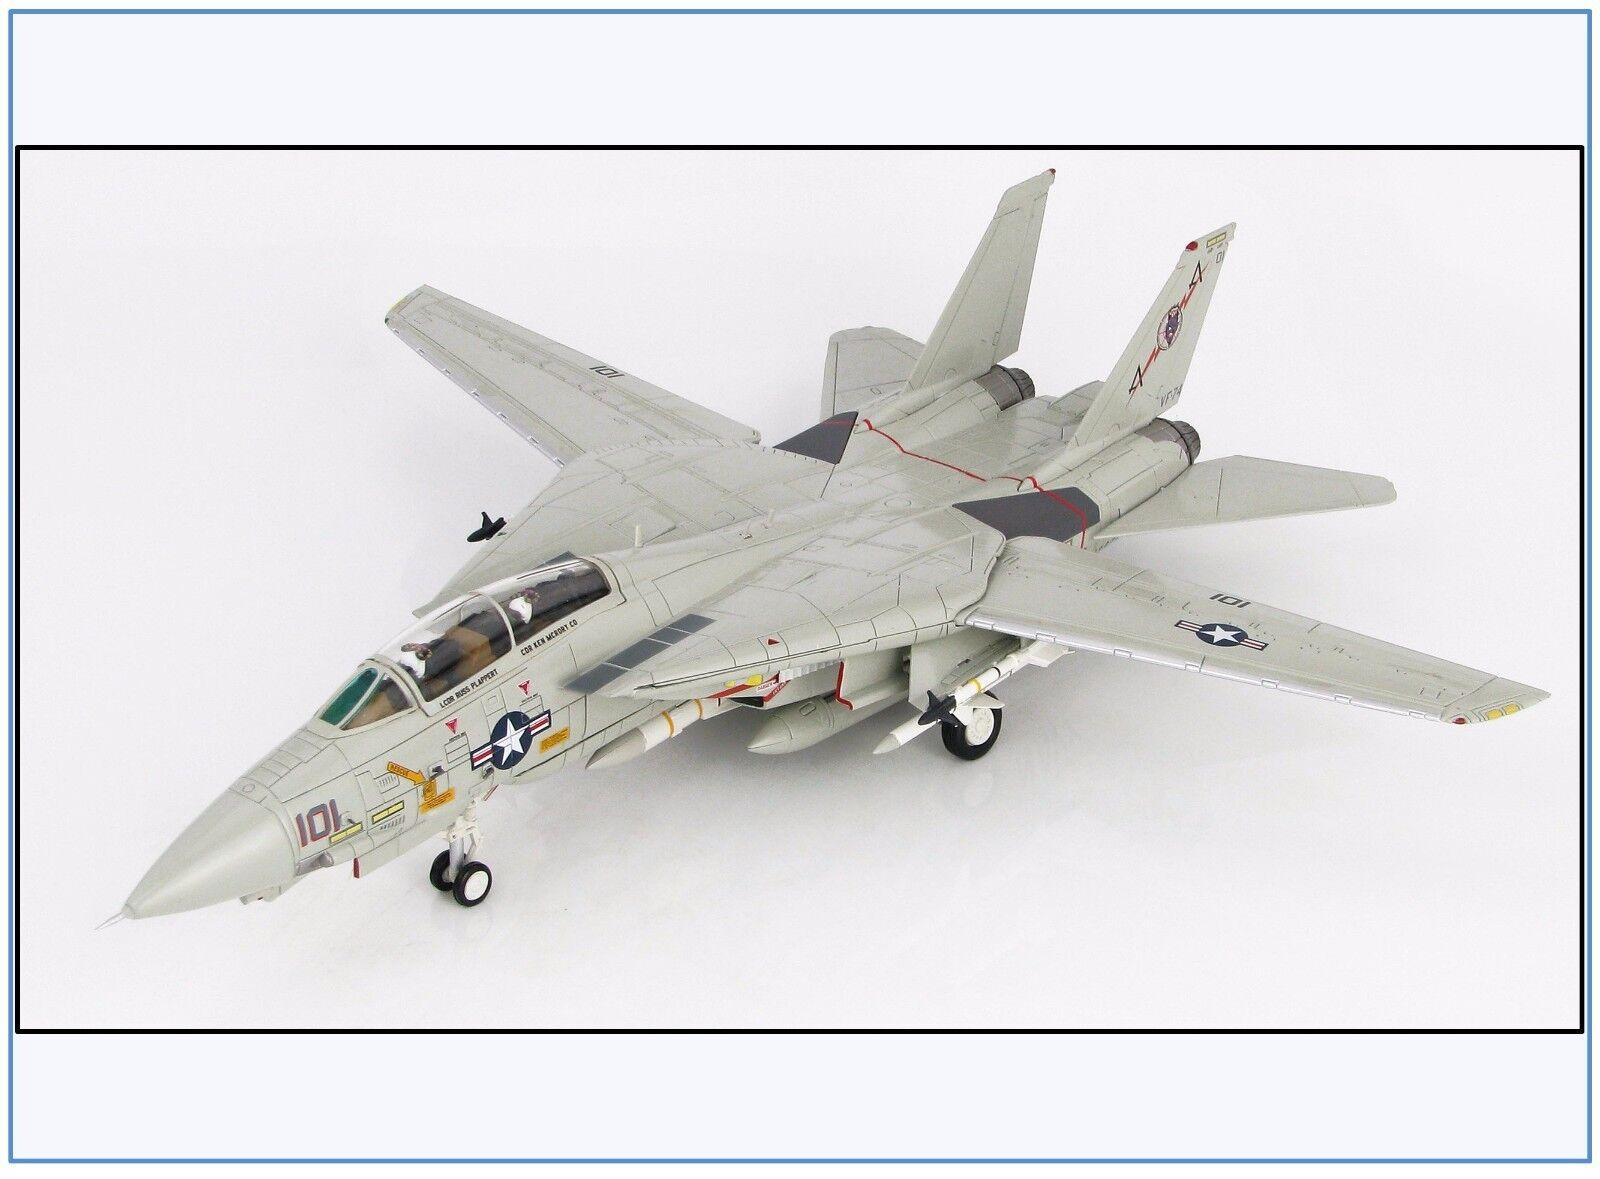 Ha5215 f-14a tomcat US Navy vf-74 vf-74 vf-74